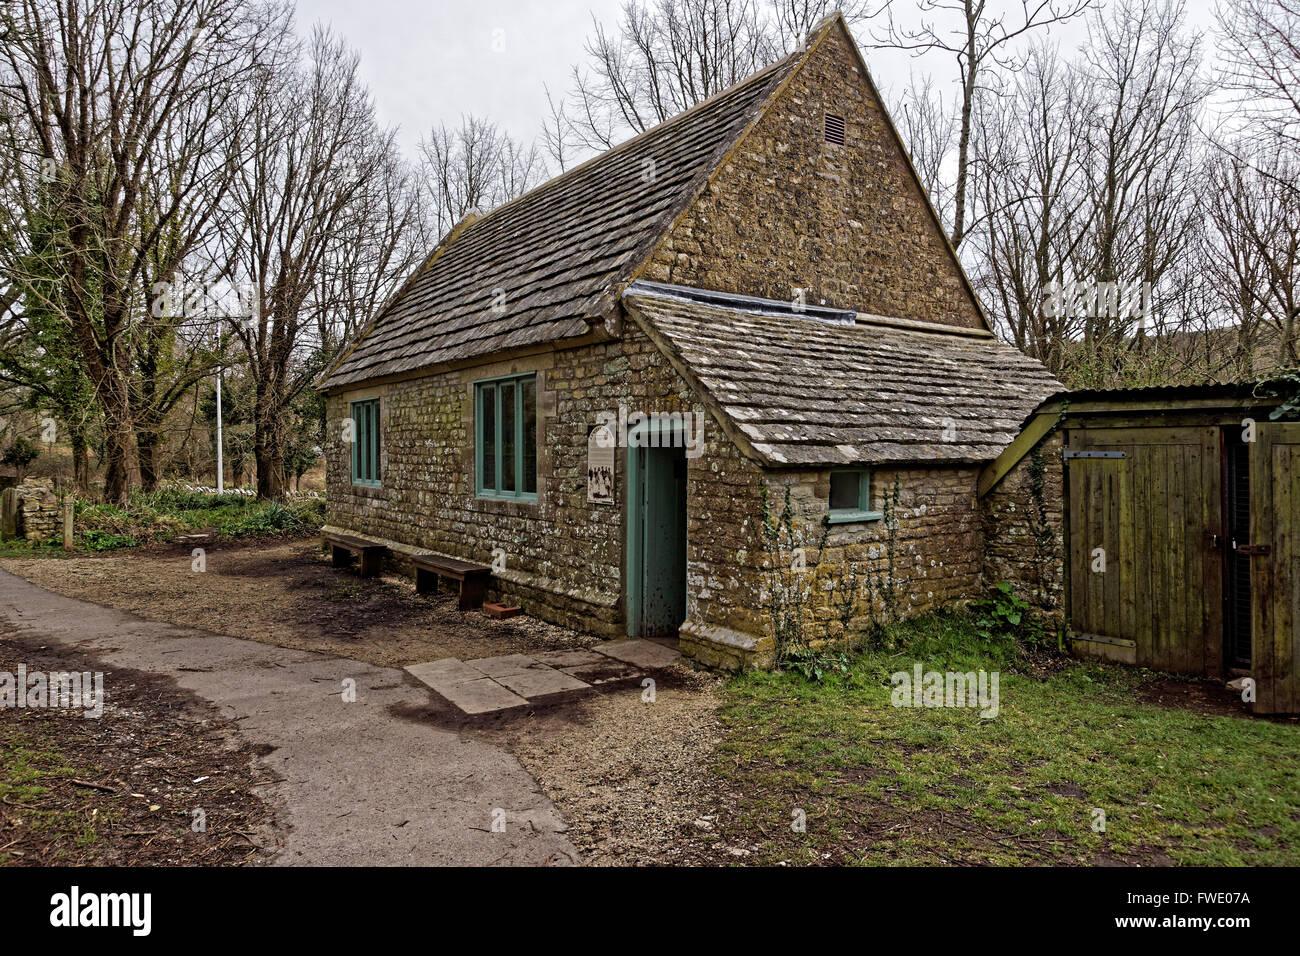 Schoolhouse in Tyneham village - Stock Image